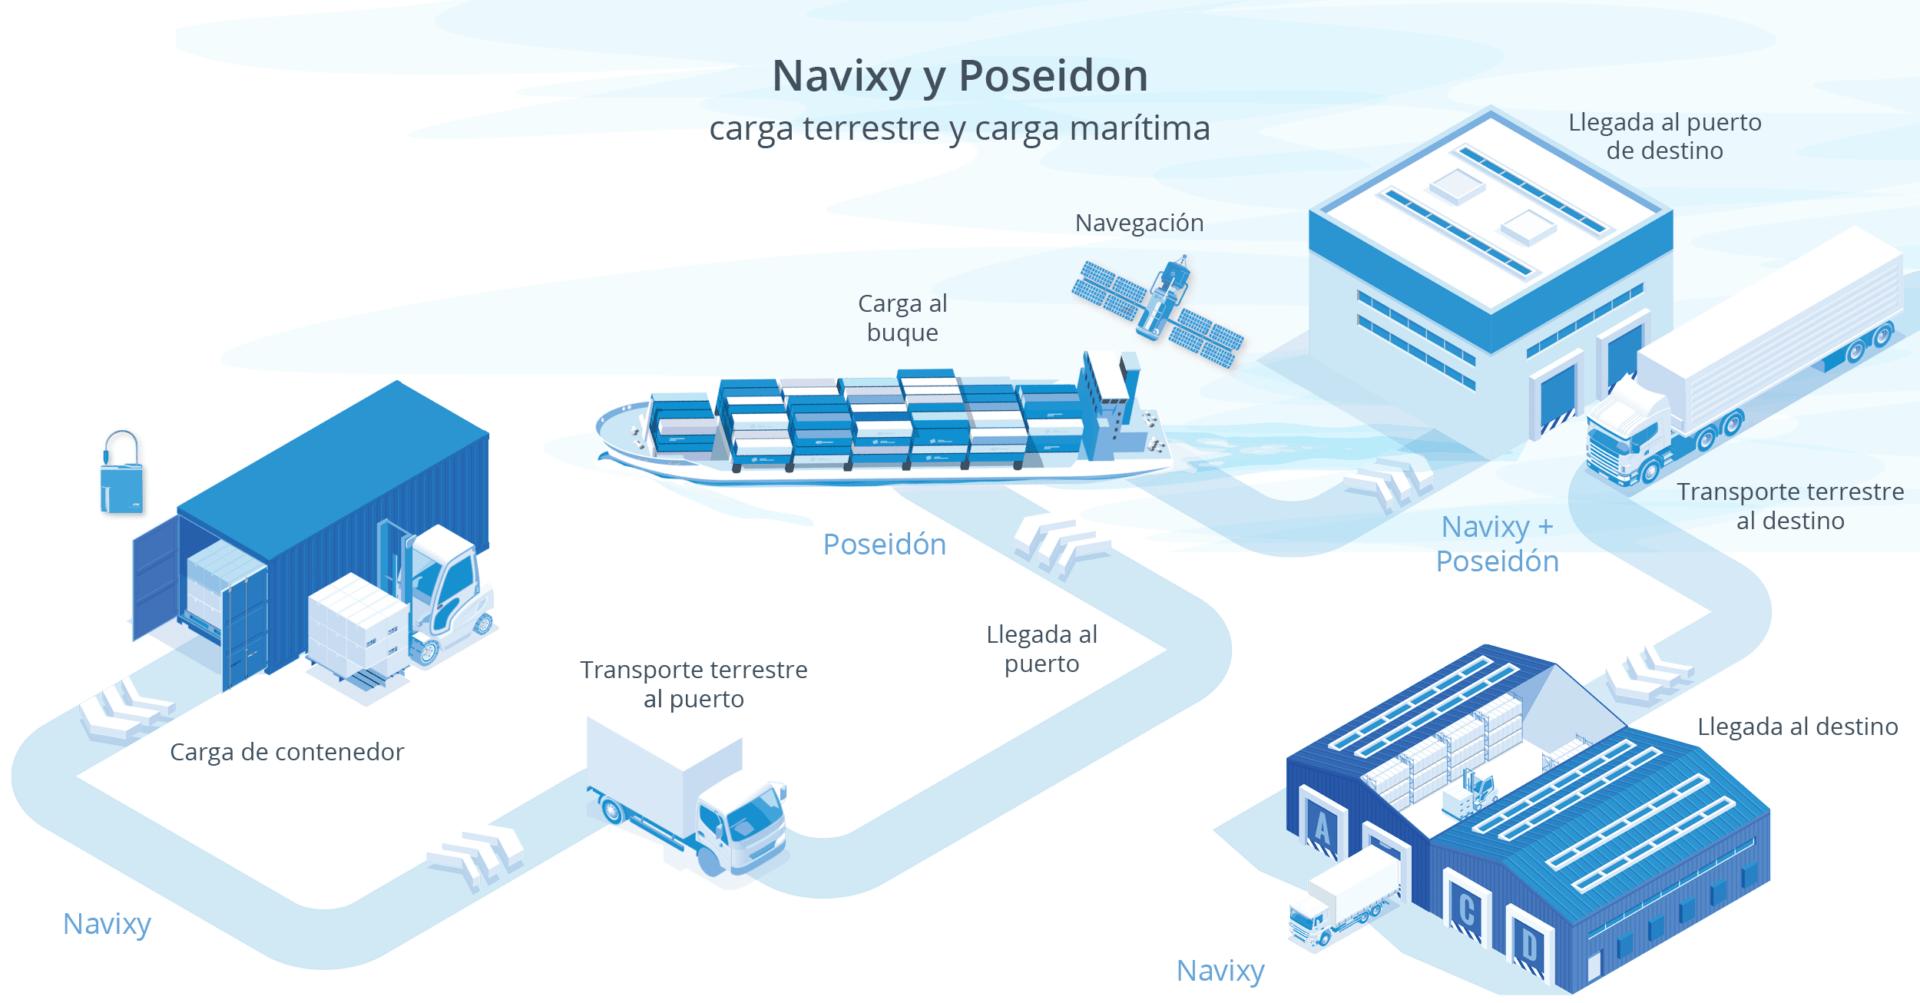 poseidon_infographic_150ppi